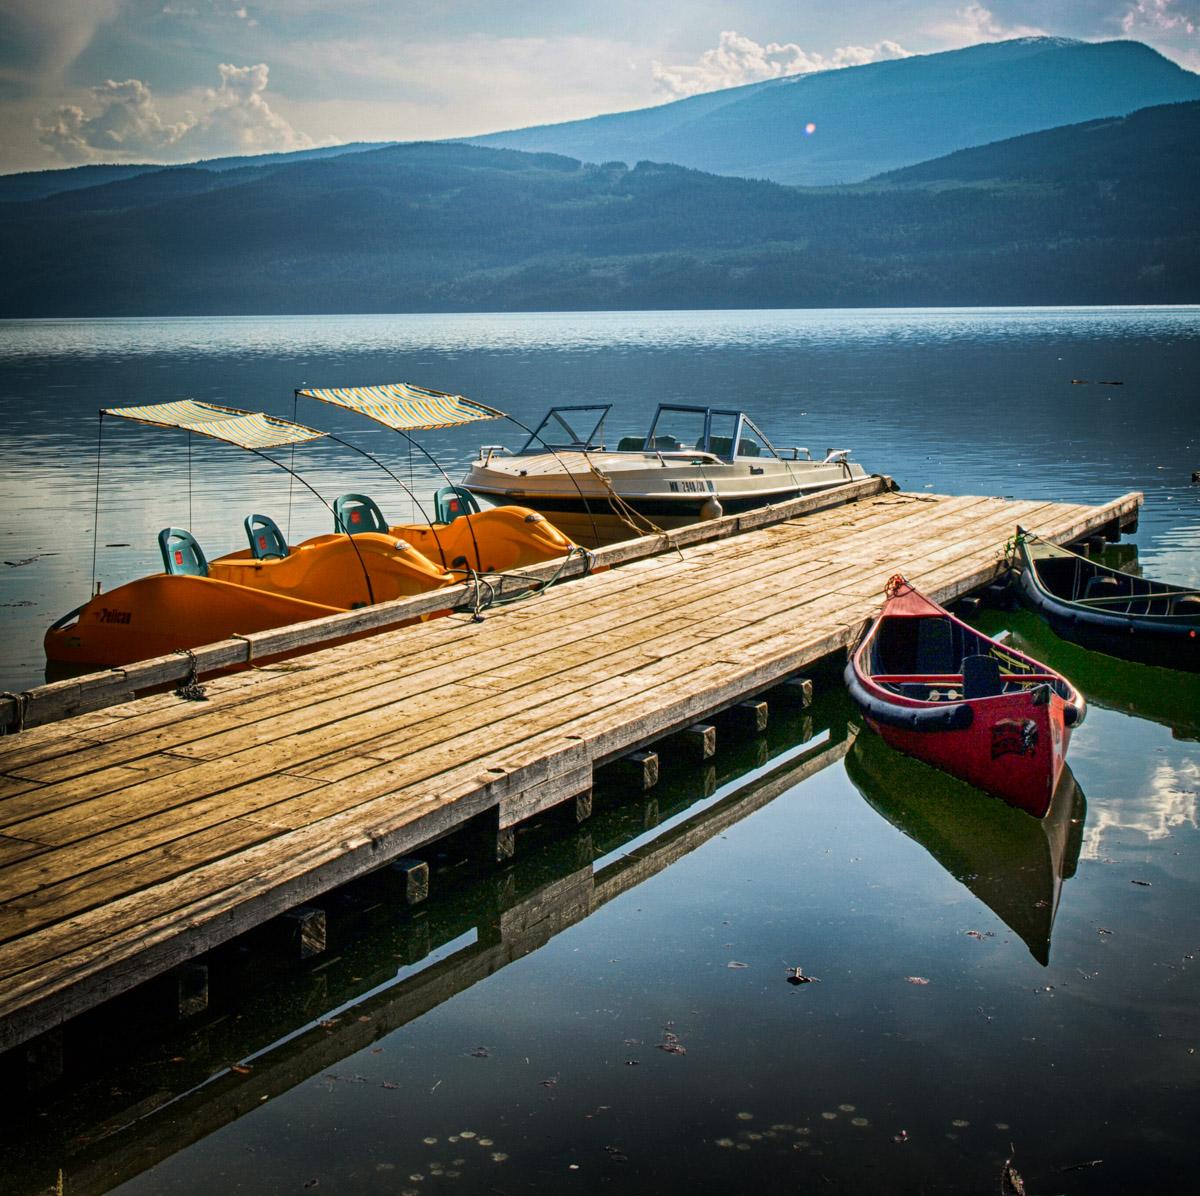 Boats at Halcyon Hot Springs